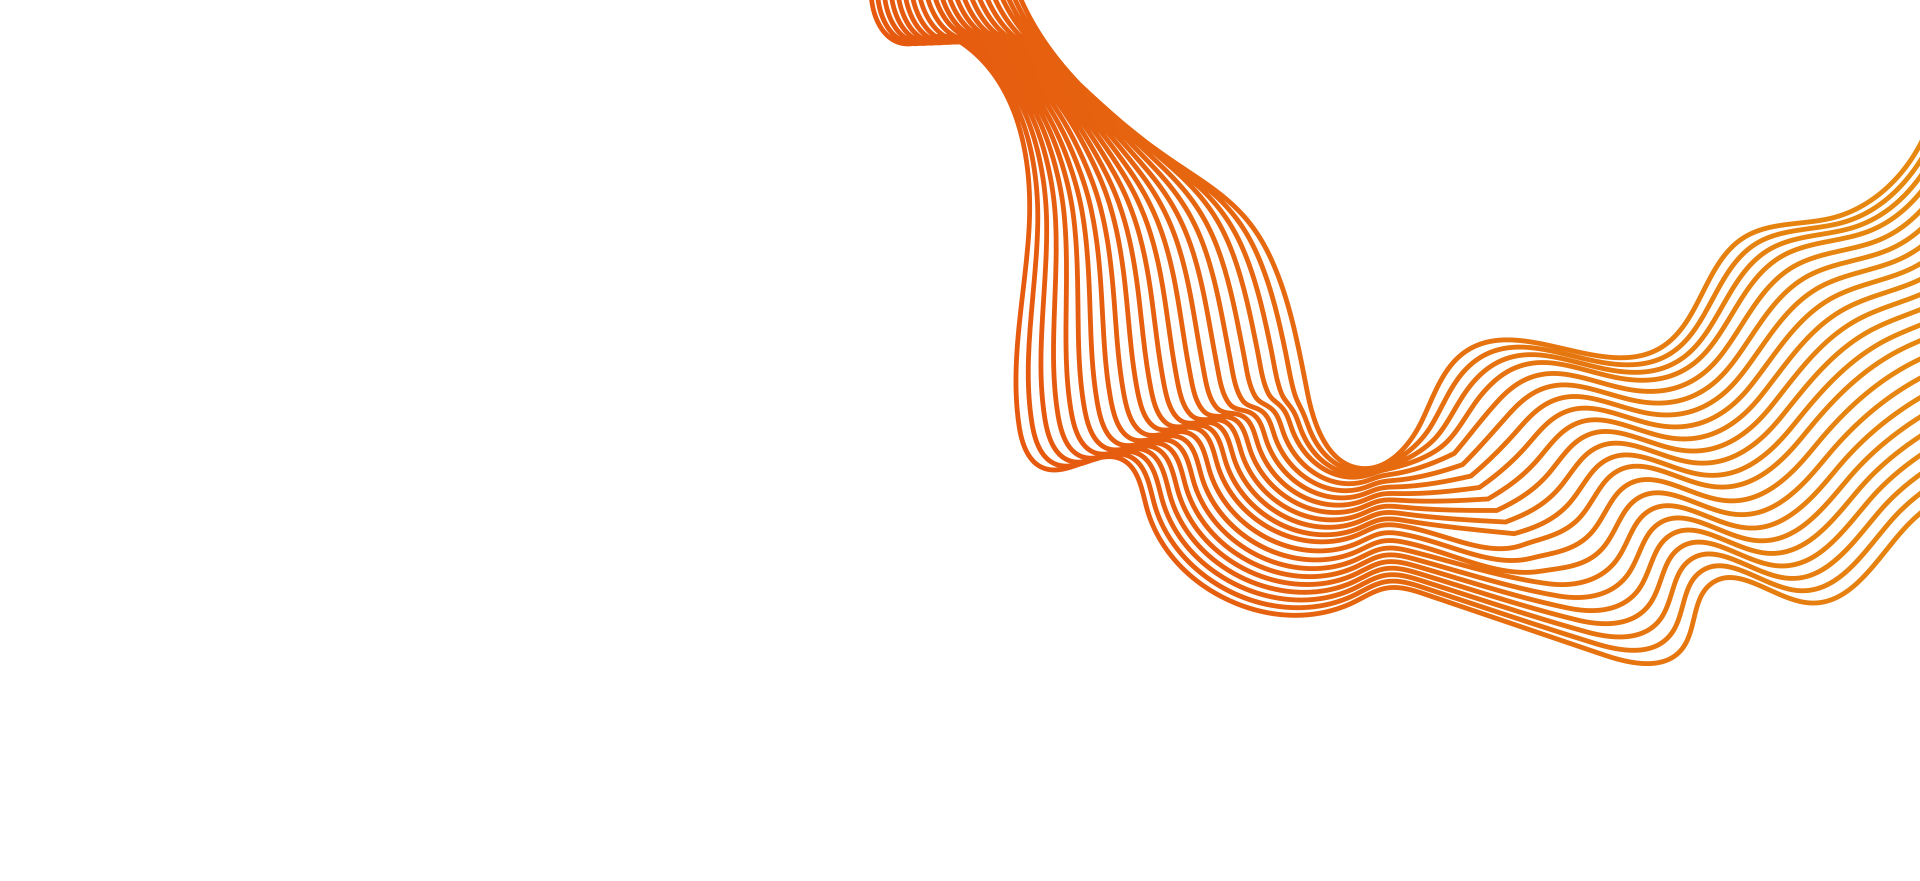 wavy-orange-gradient-lines-optimized.png - Clanys ...